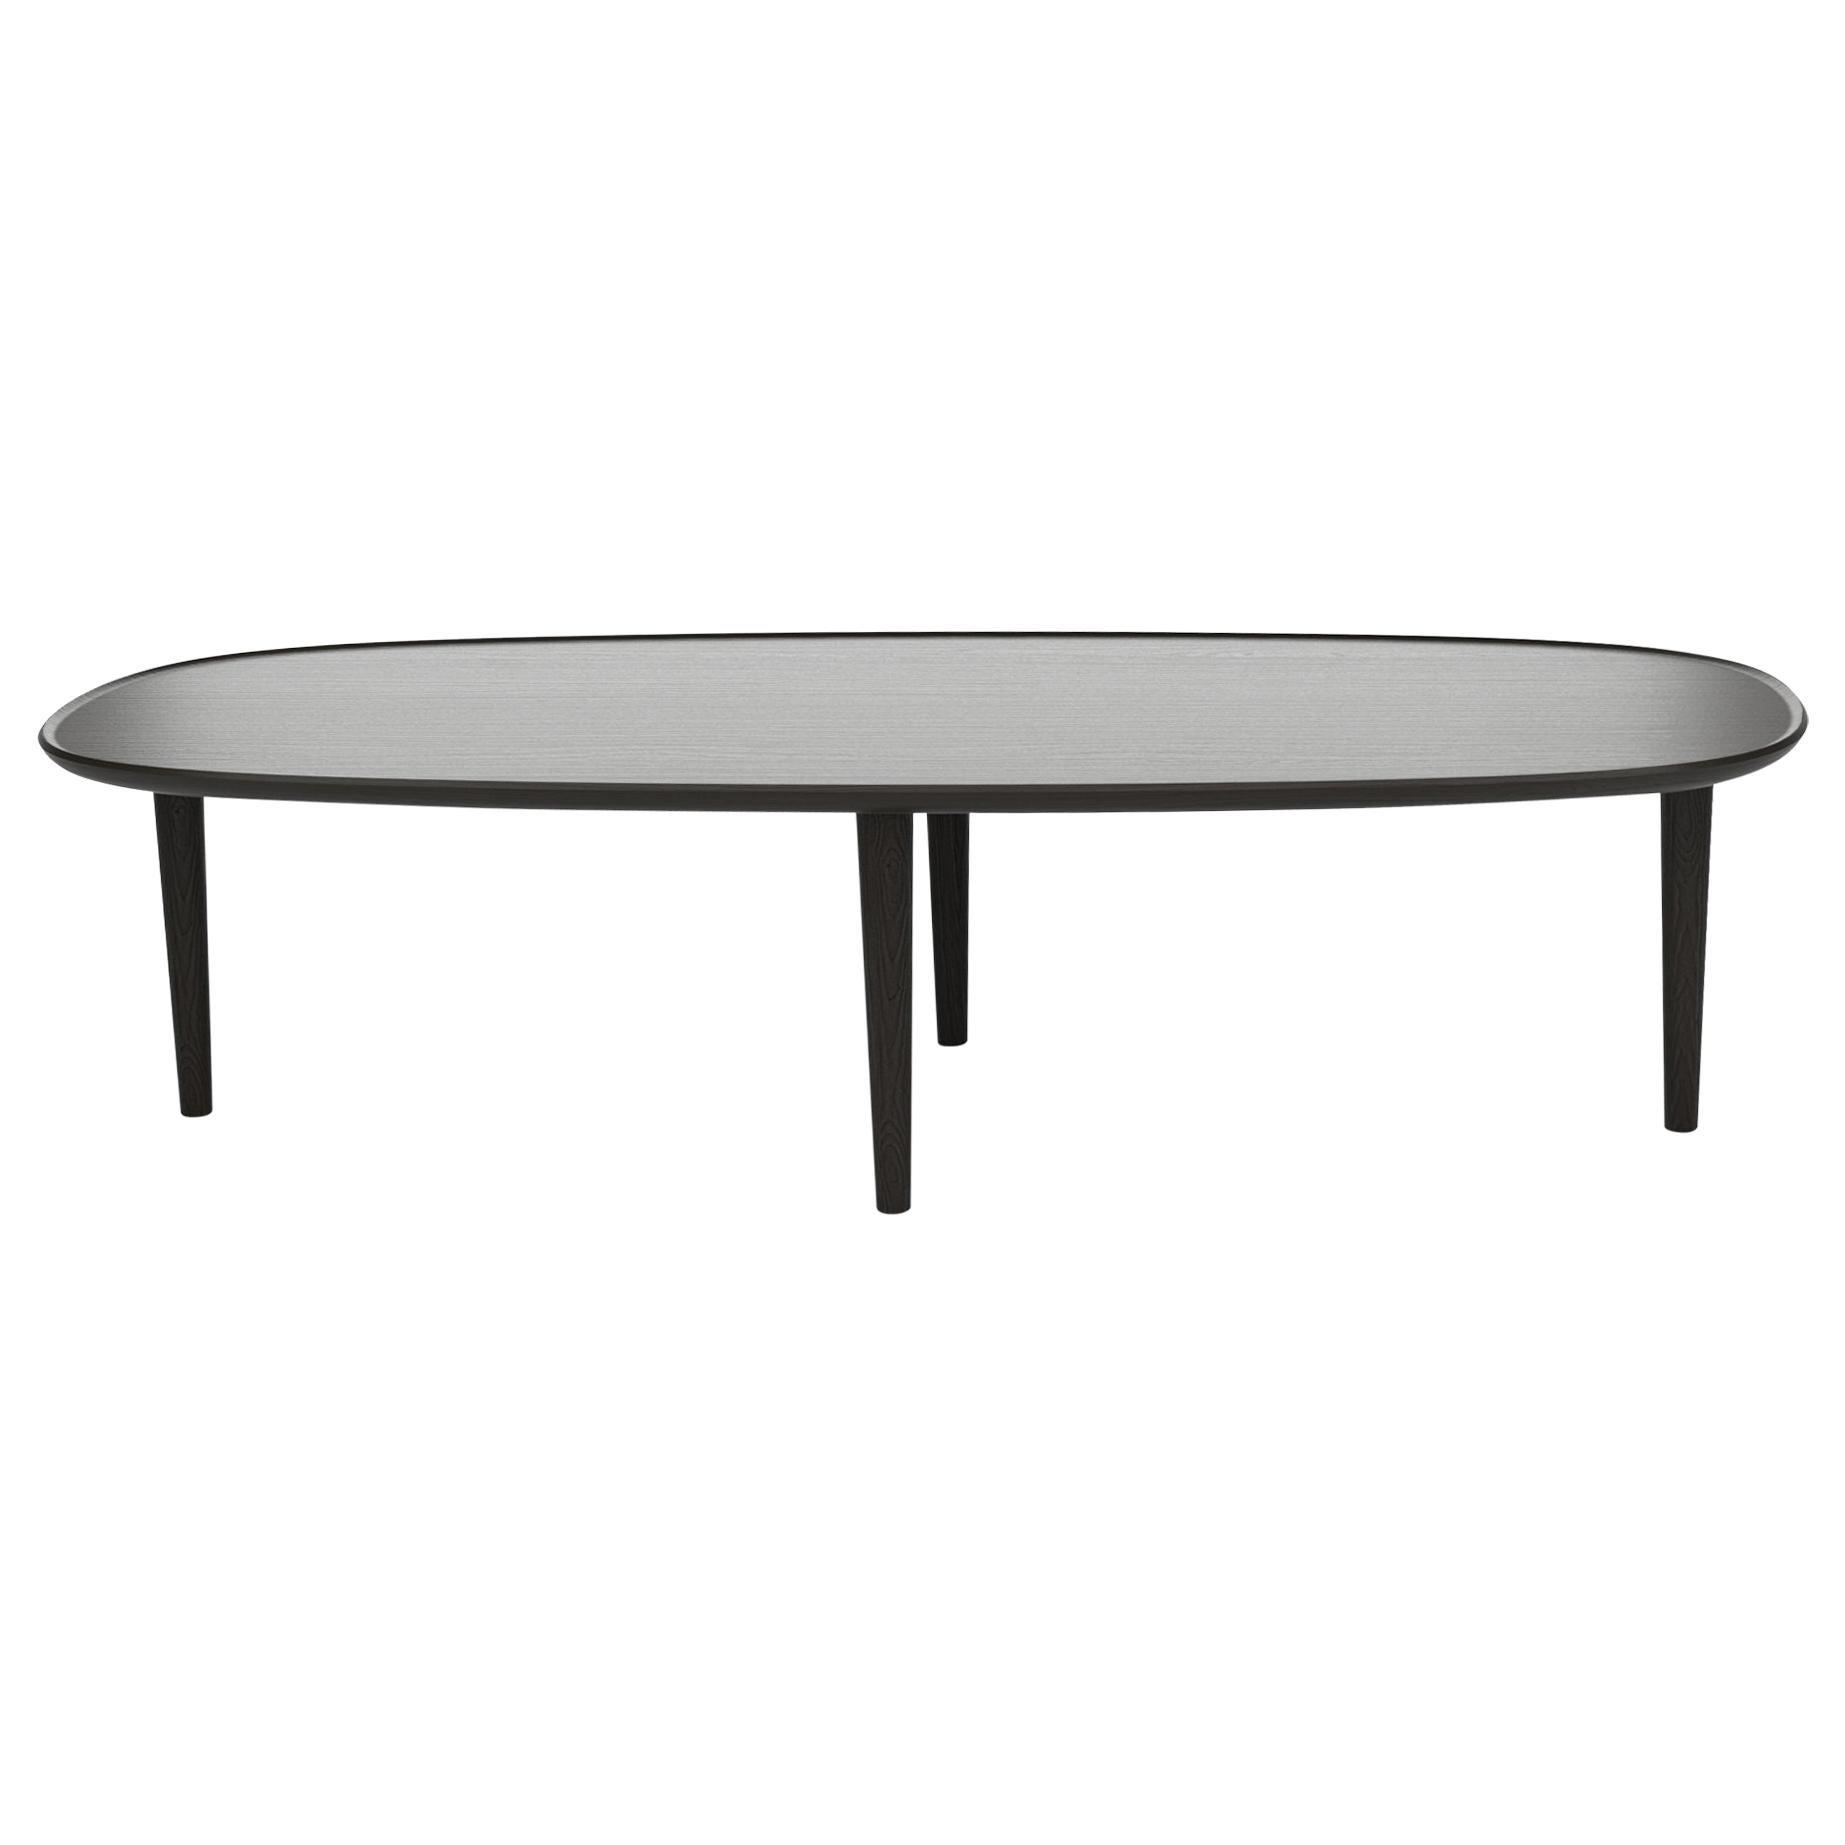 Fiori Table 140, Black